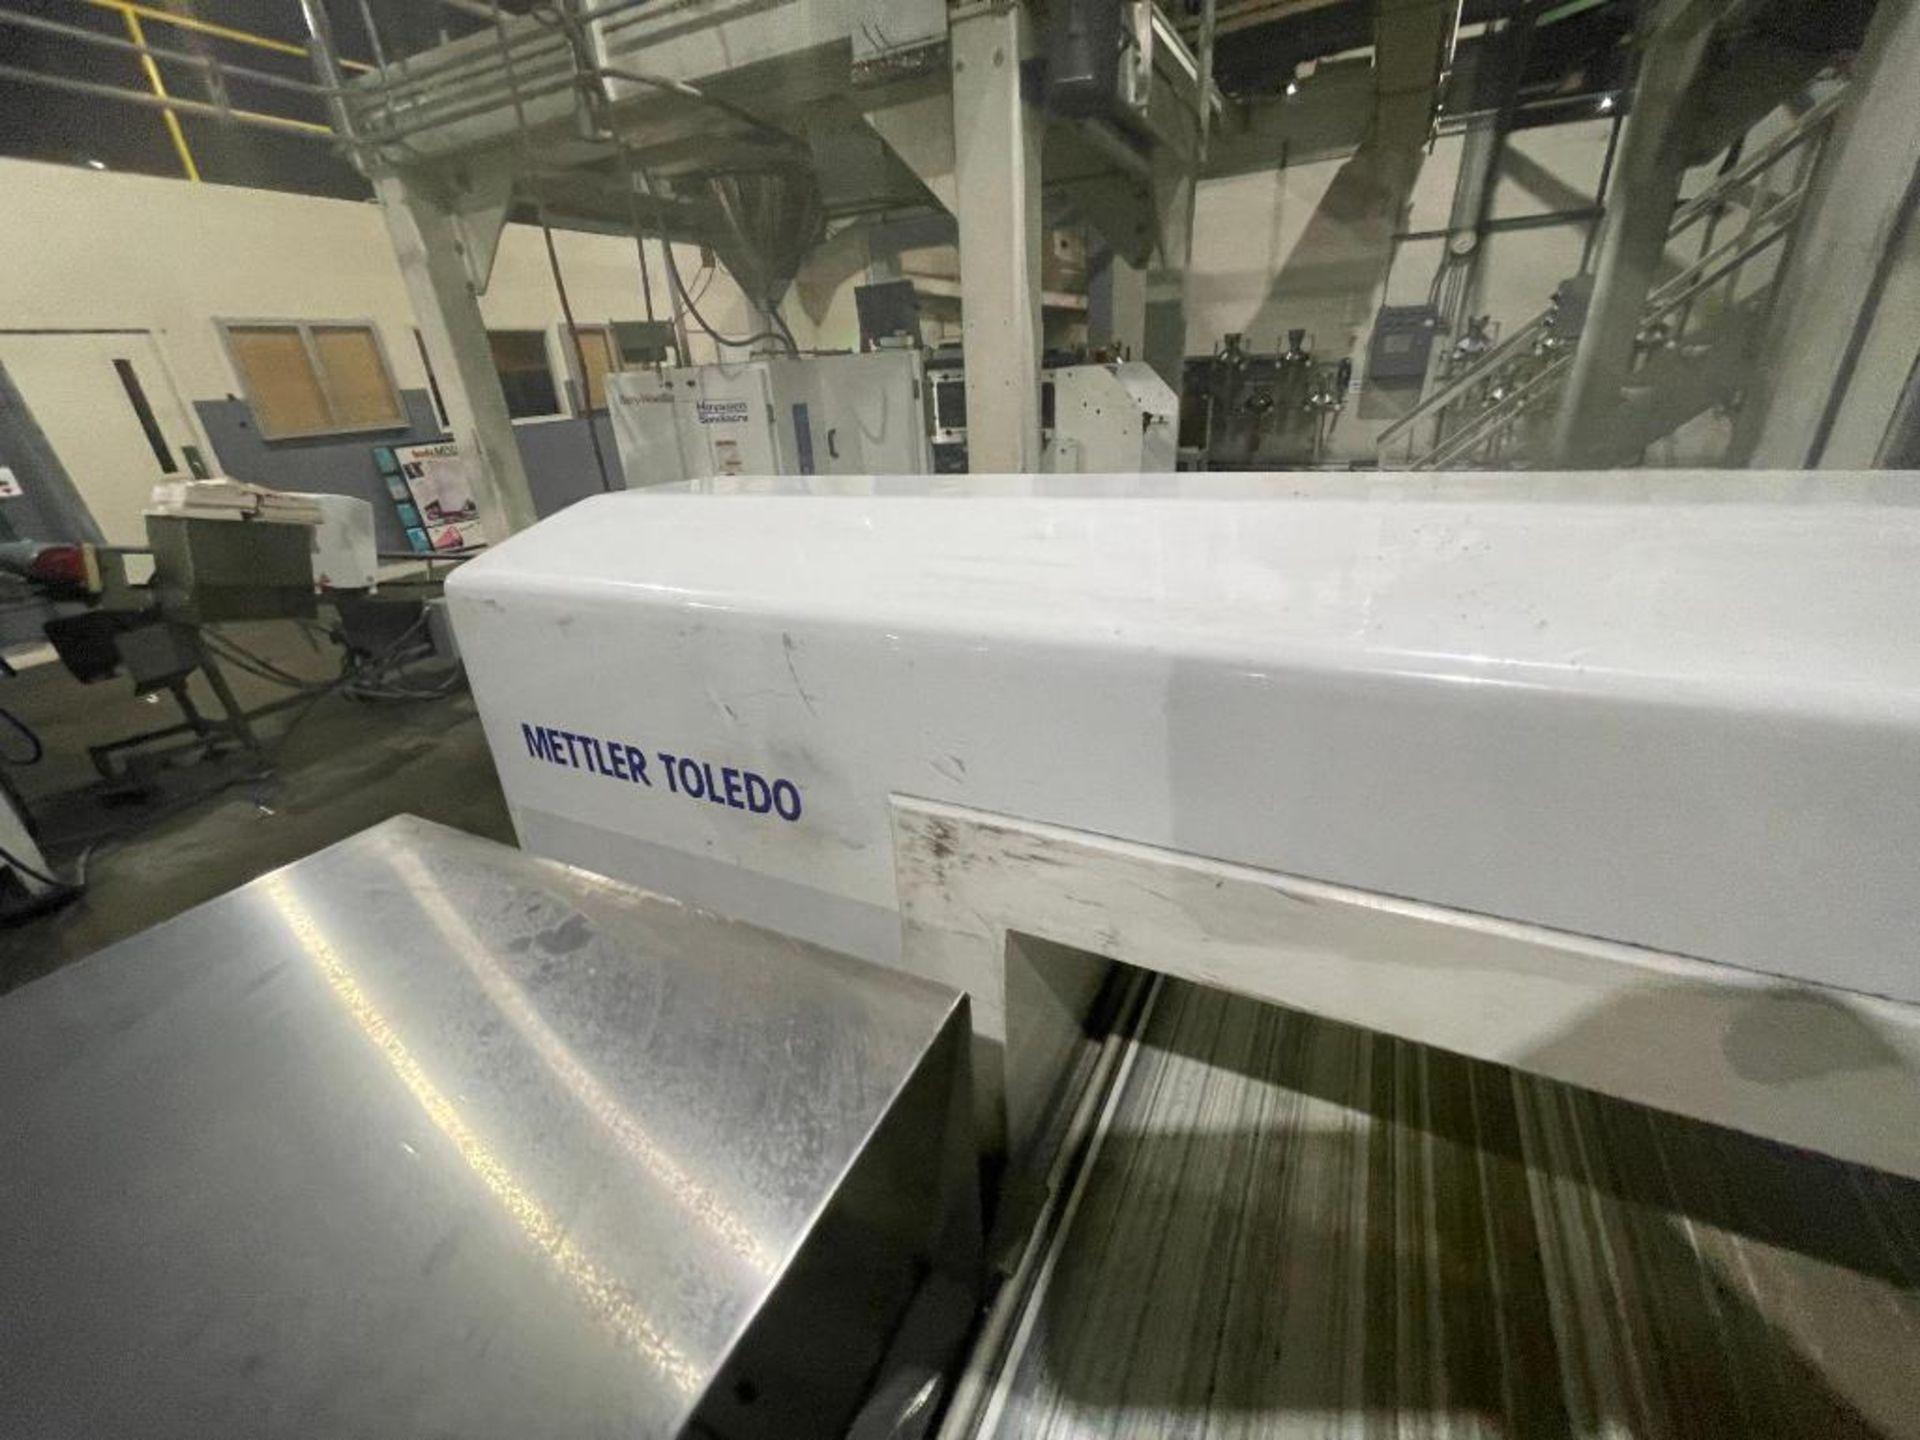 Mettler Toledo metal detector, model V4-1 - Image 7 of 10